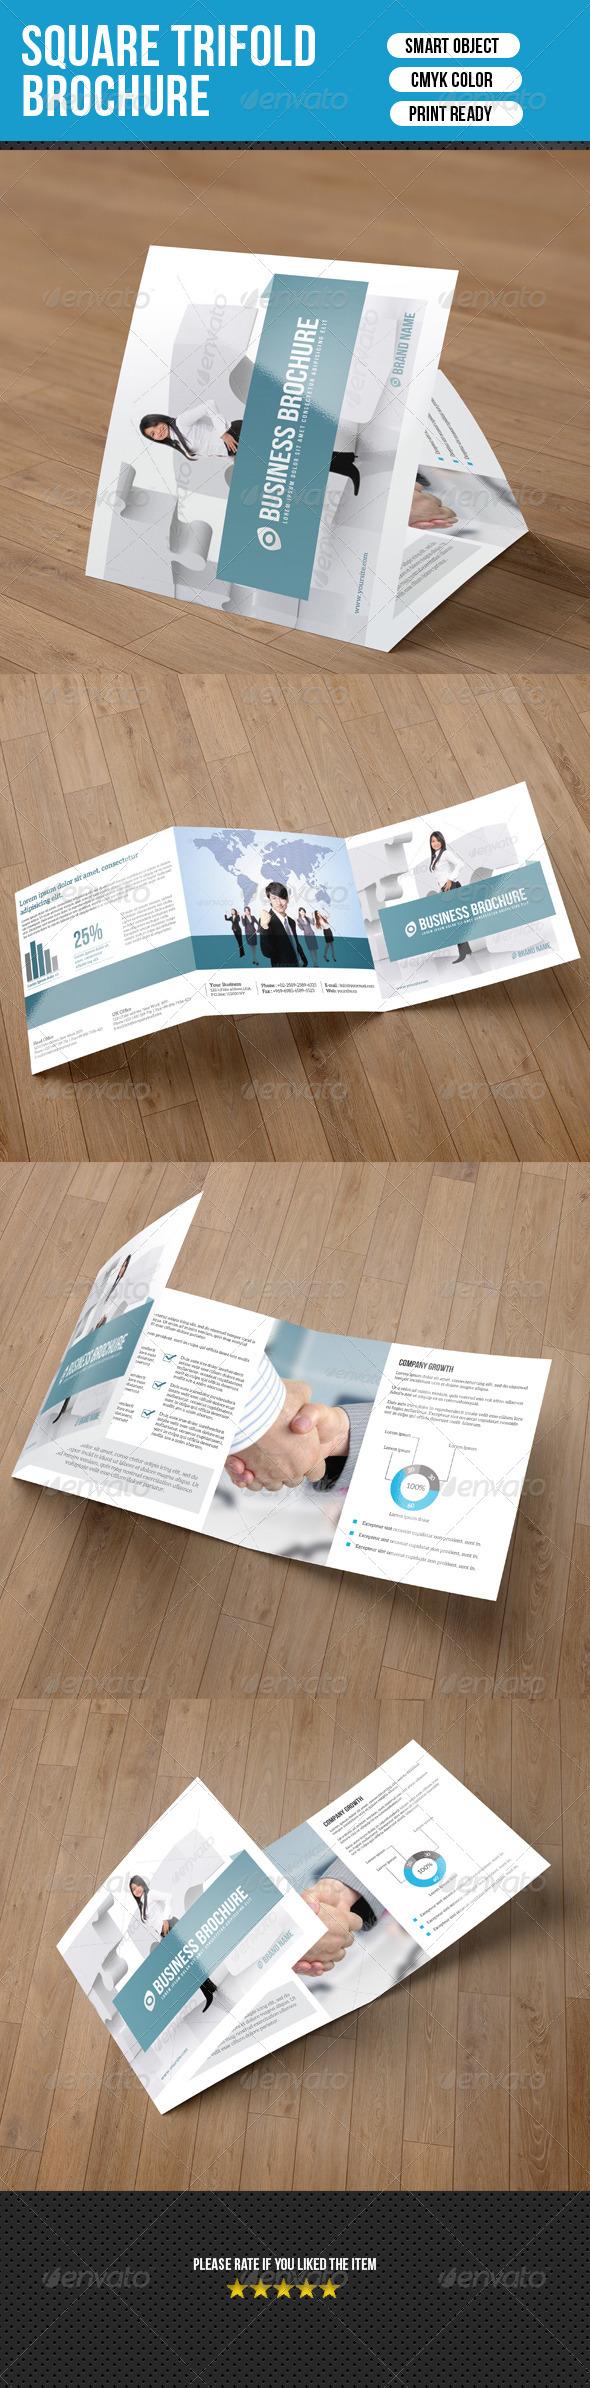 GraphicRiver Square Trifold Brochure-Business 7500491